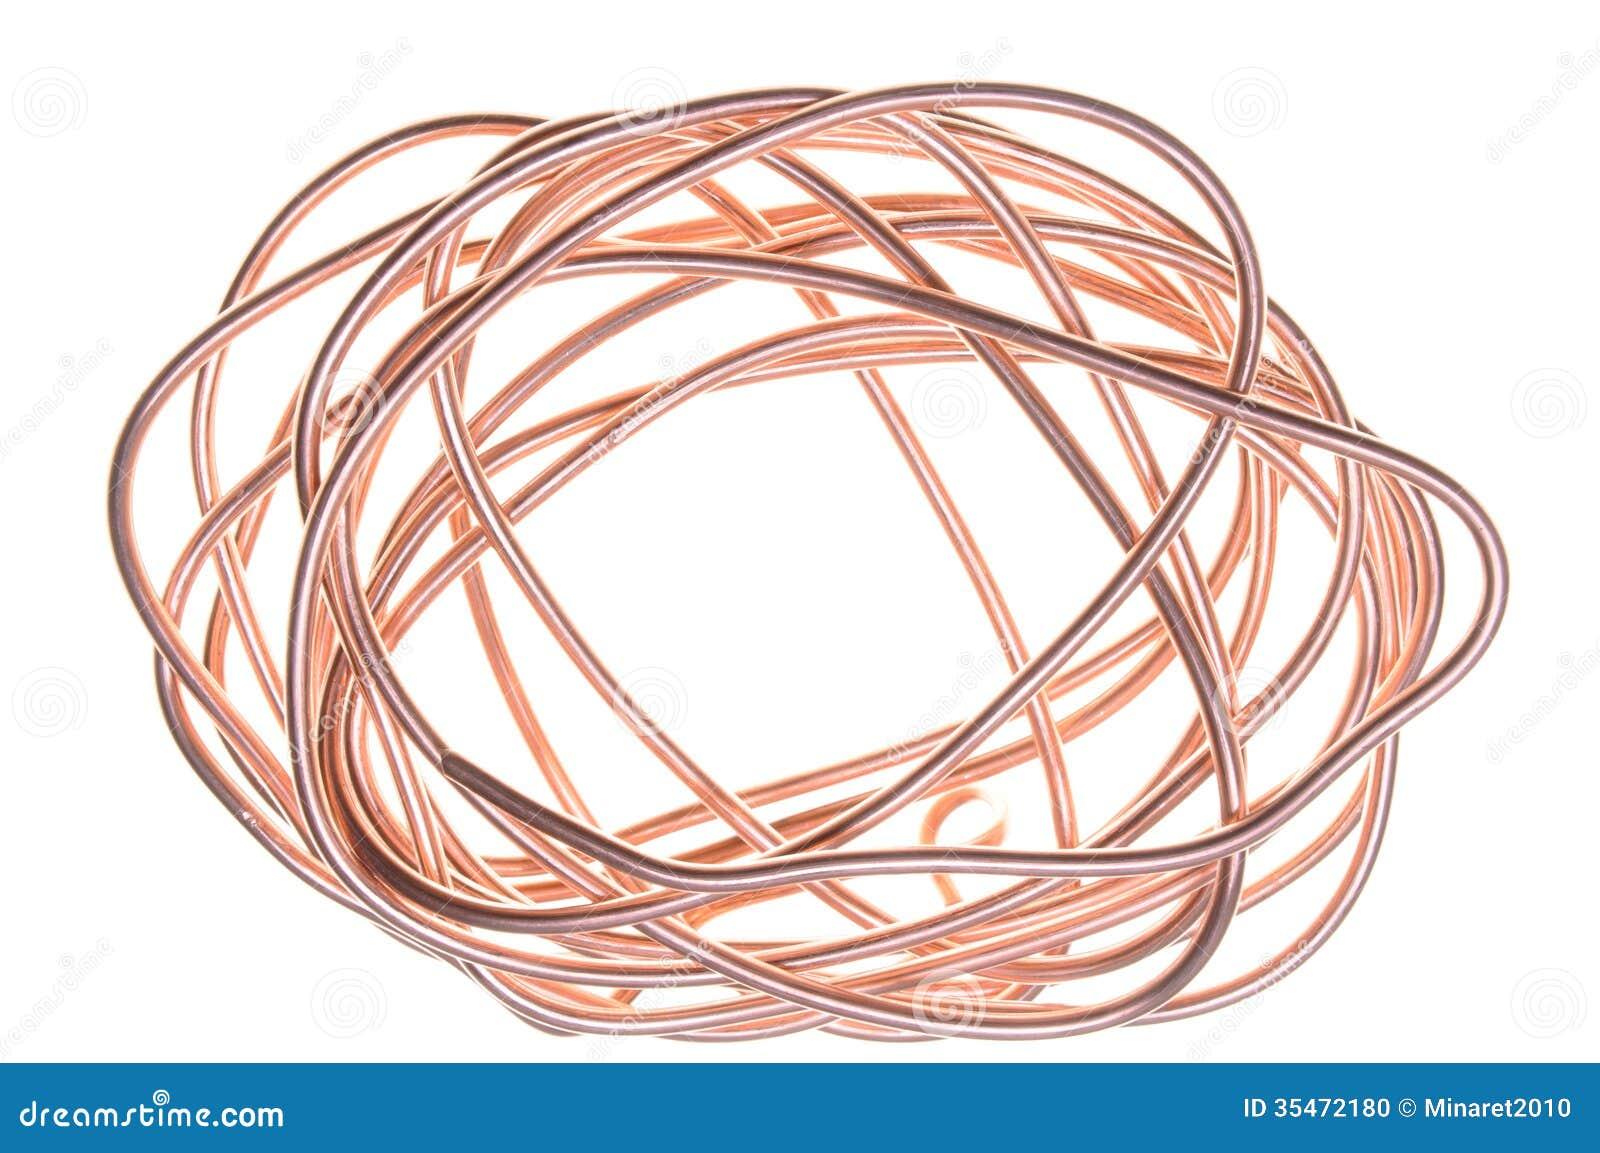 Copper Wire Bundle : Copper wire stock photo image of economy electron